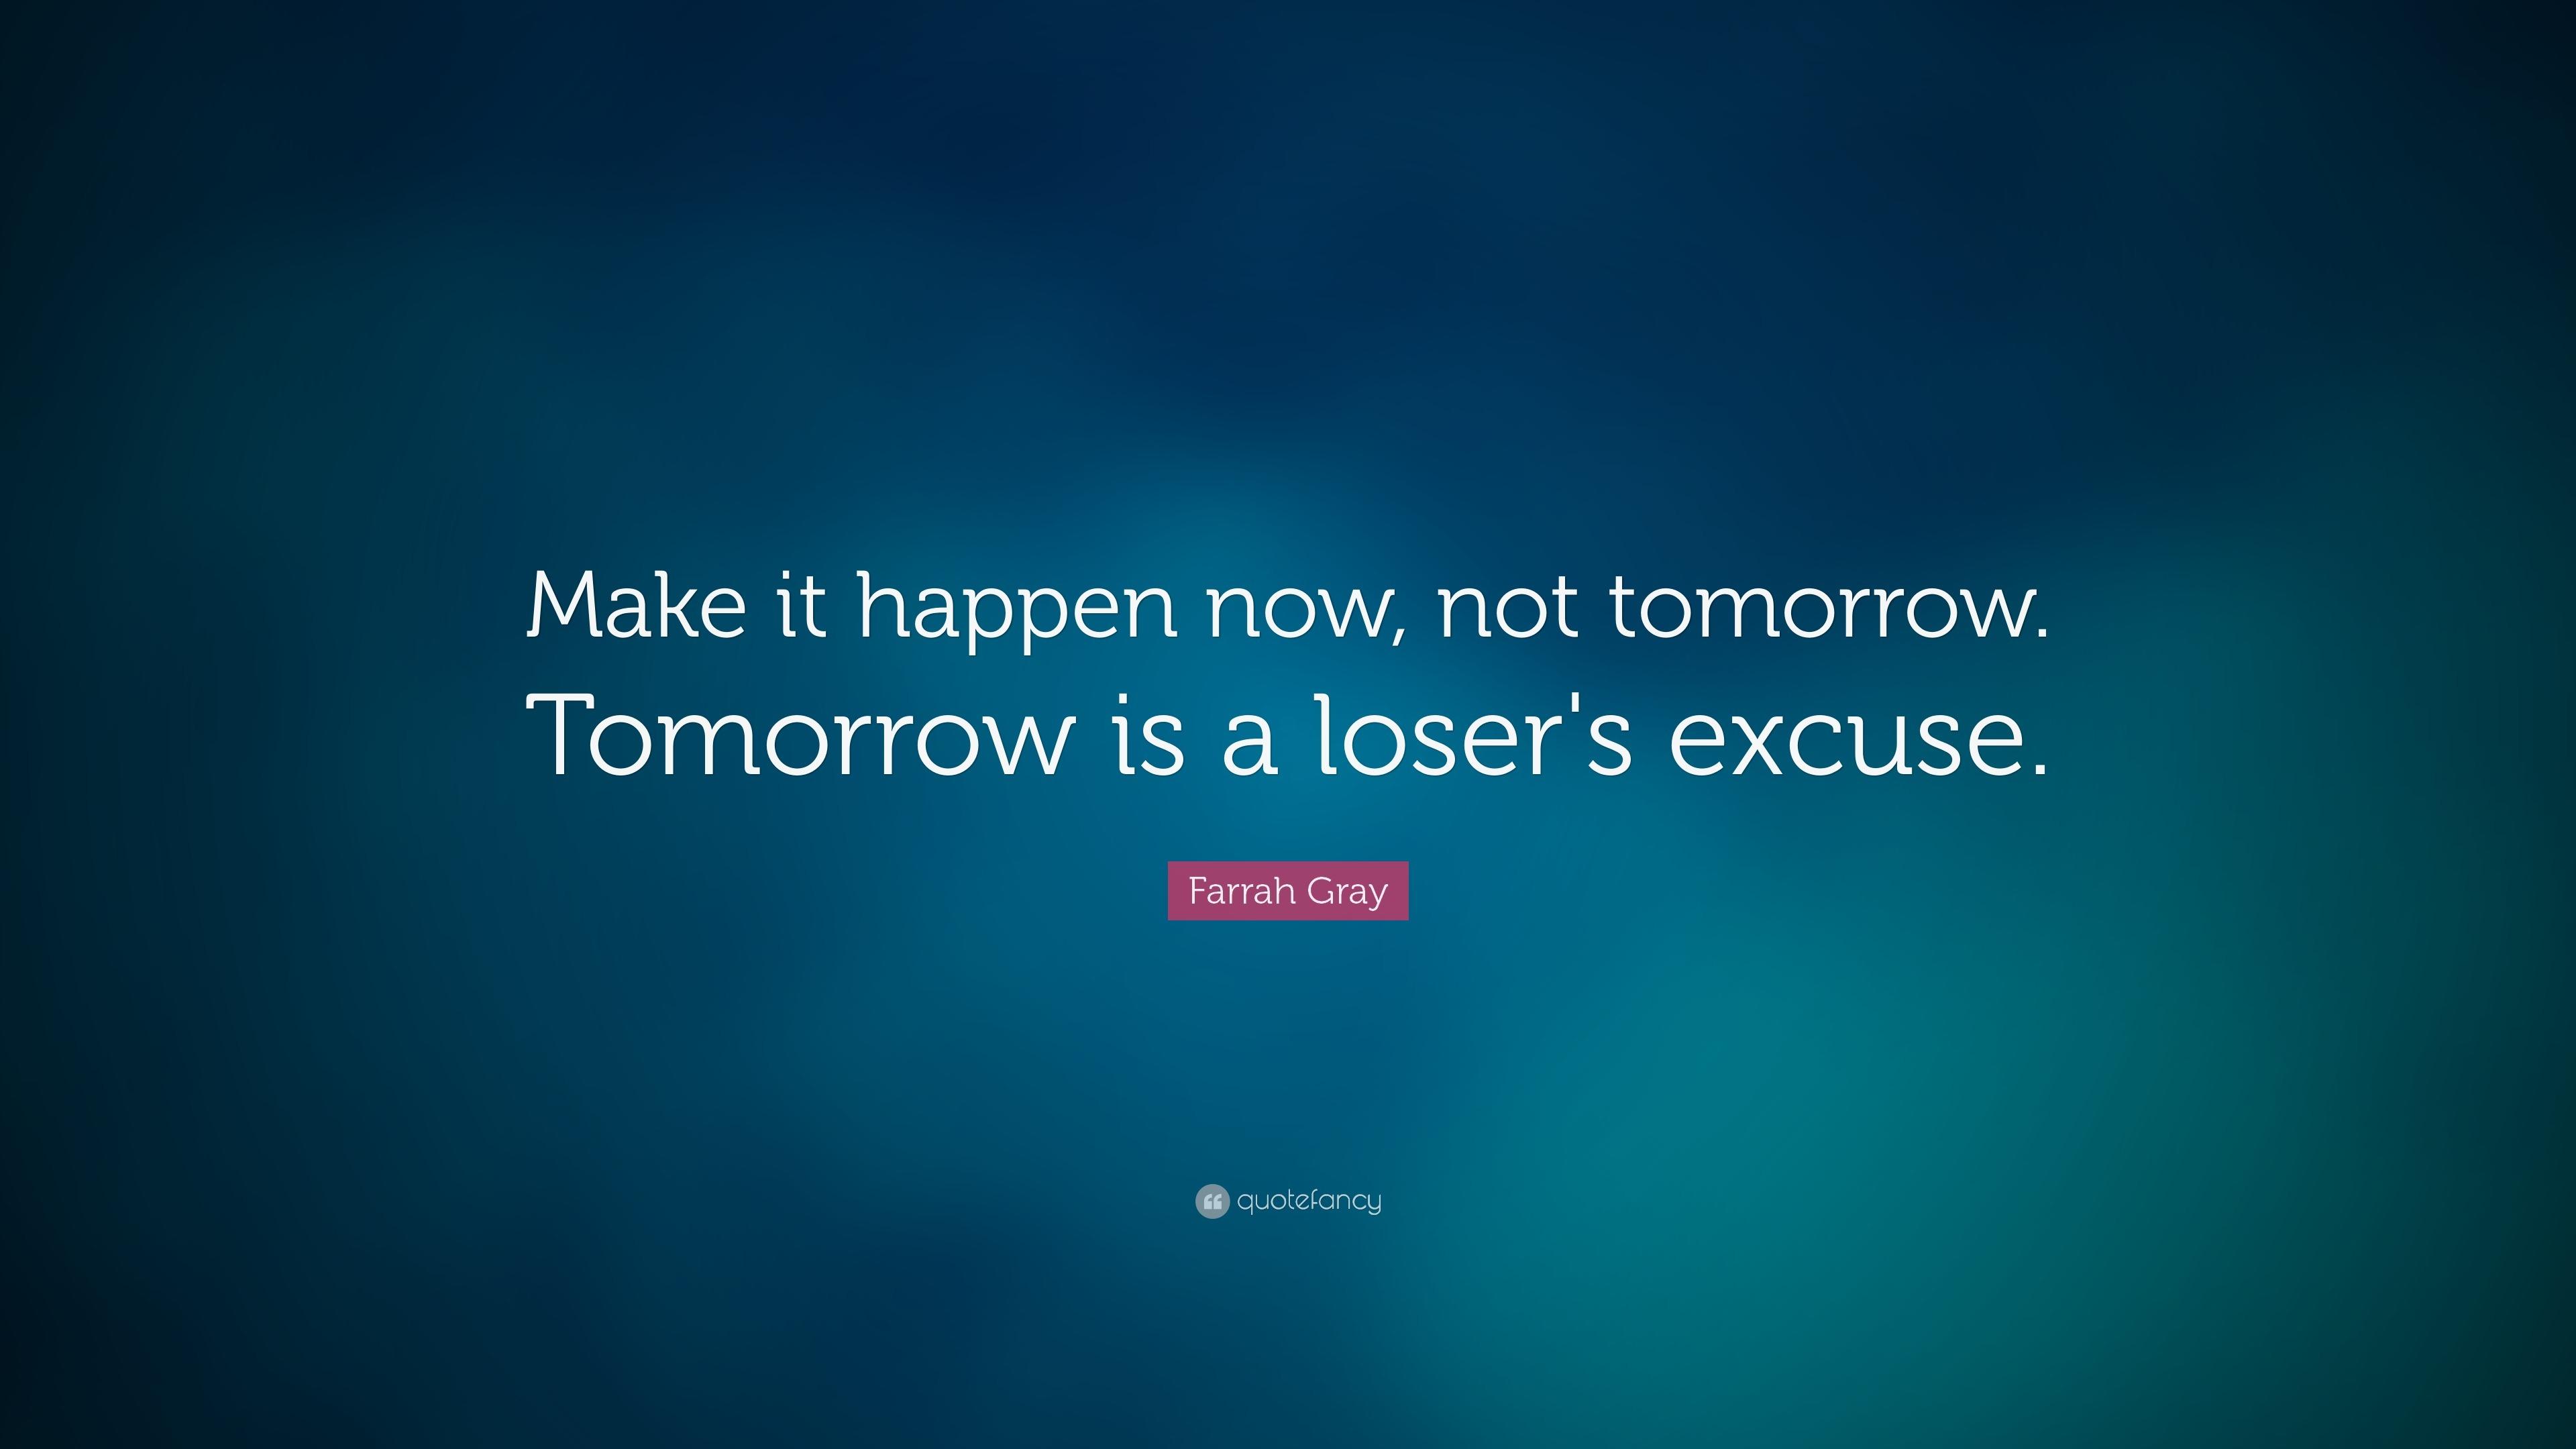 Make It Happen Quotes Wallpaper Farrah Gray Quote Make It Happen Now Not Tomorrow